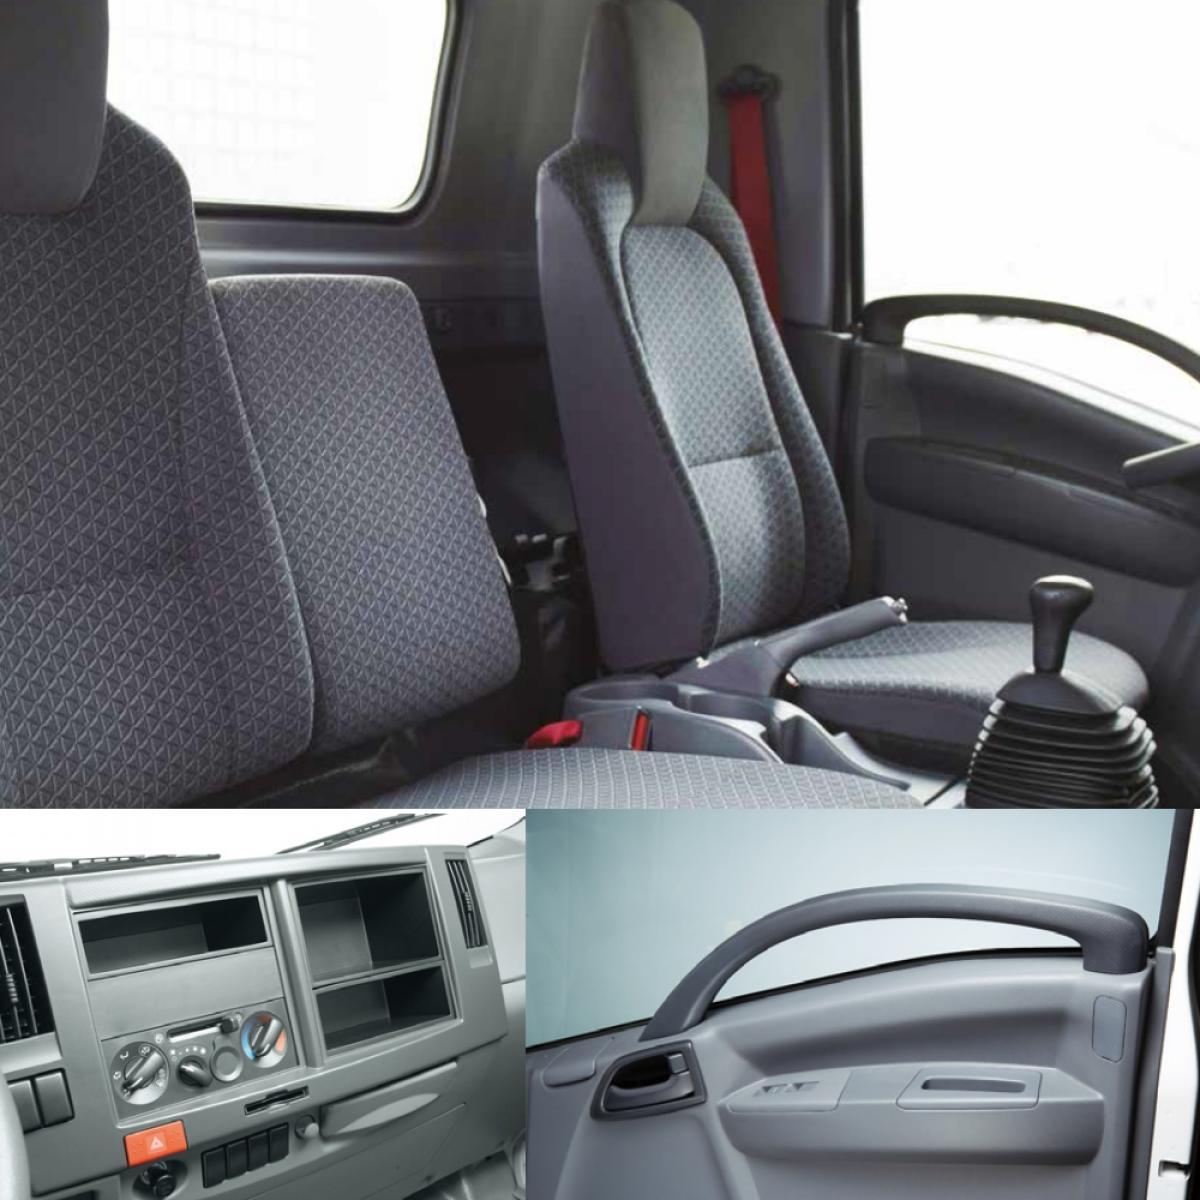 Isuzu M21 Double Cab Comfort